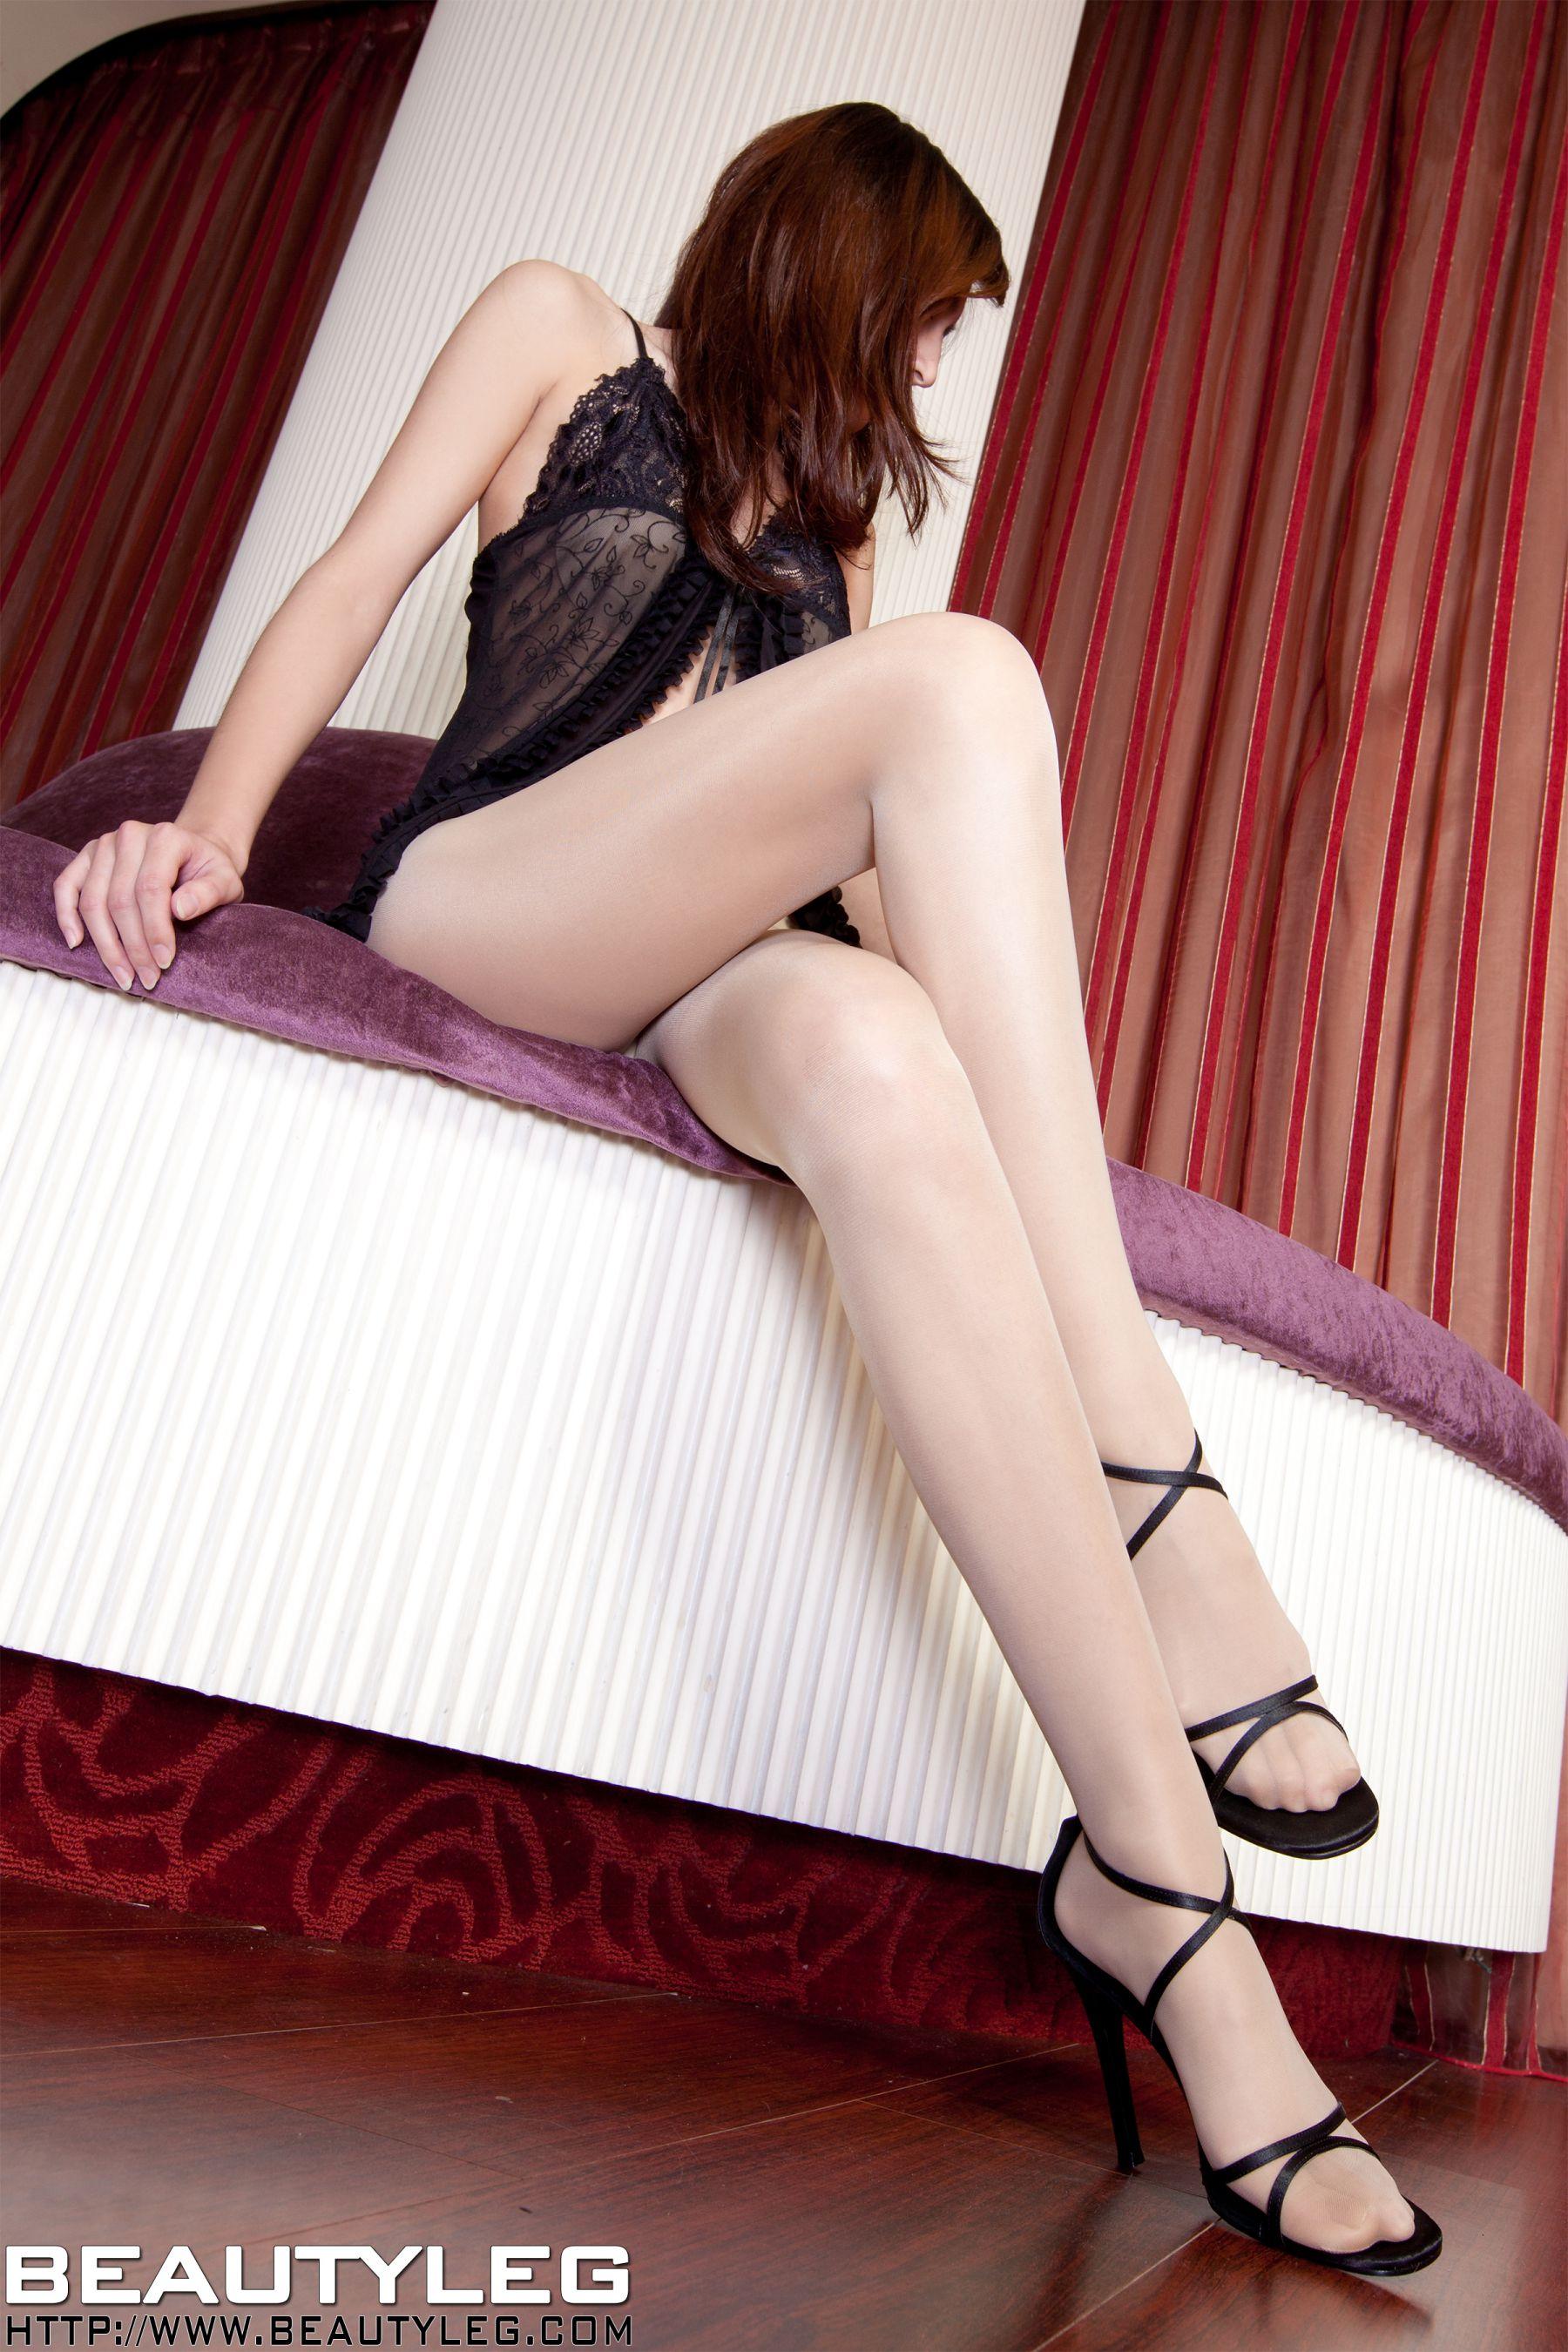 VOL.1458 [Beautyleg]美腿丁字裤高跟高跟凉鞋:黄苇萱(Beautyleg腿模Sunny)高品质写真套图(44P)